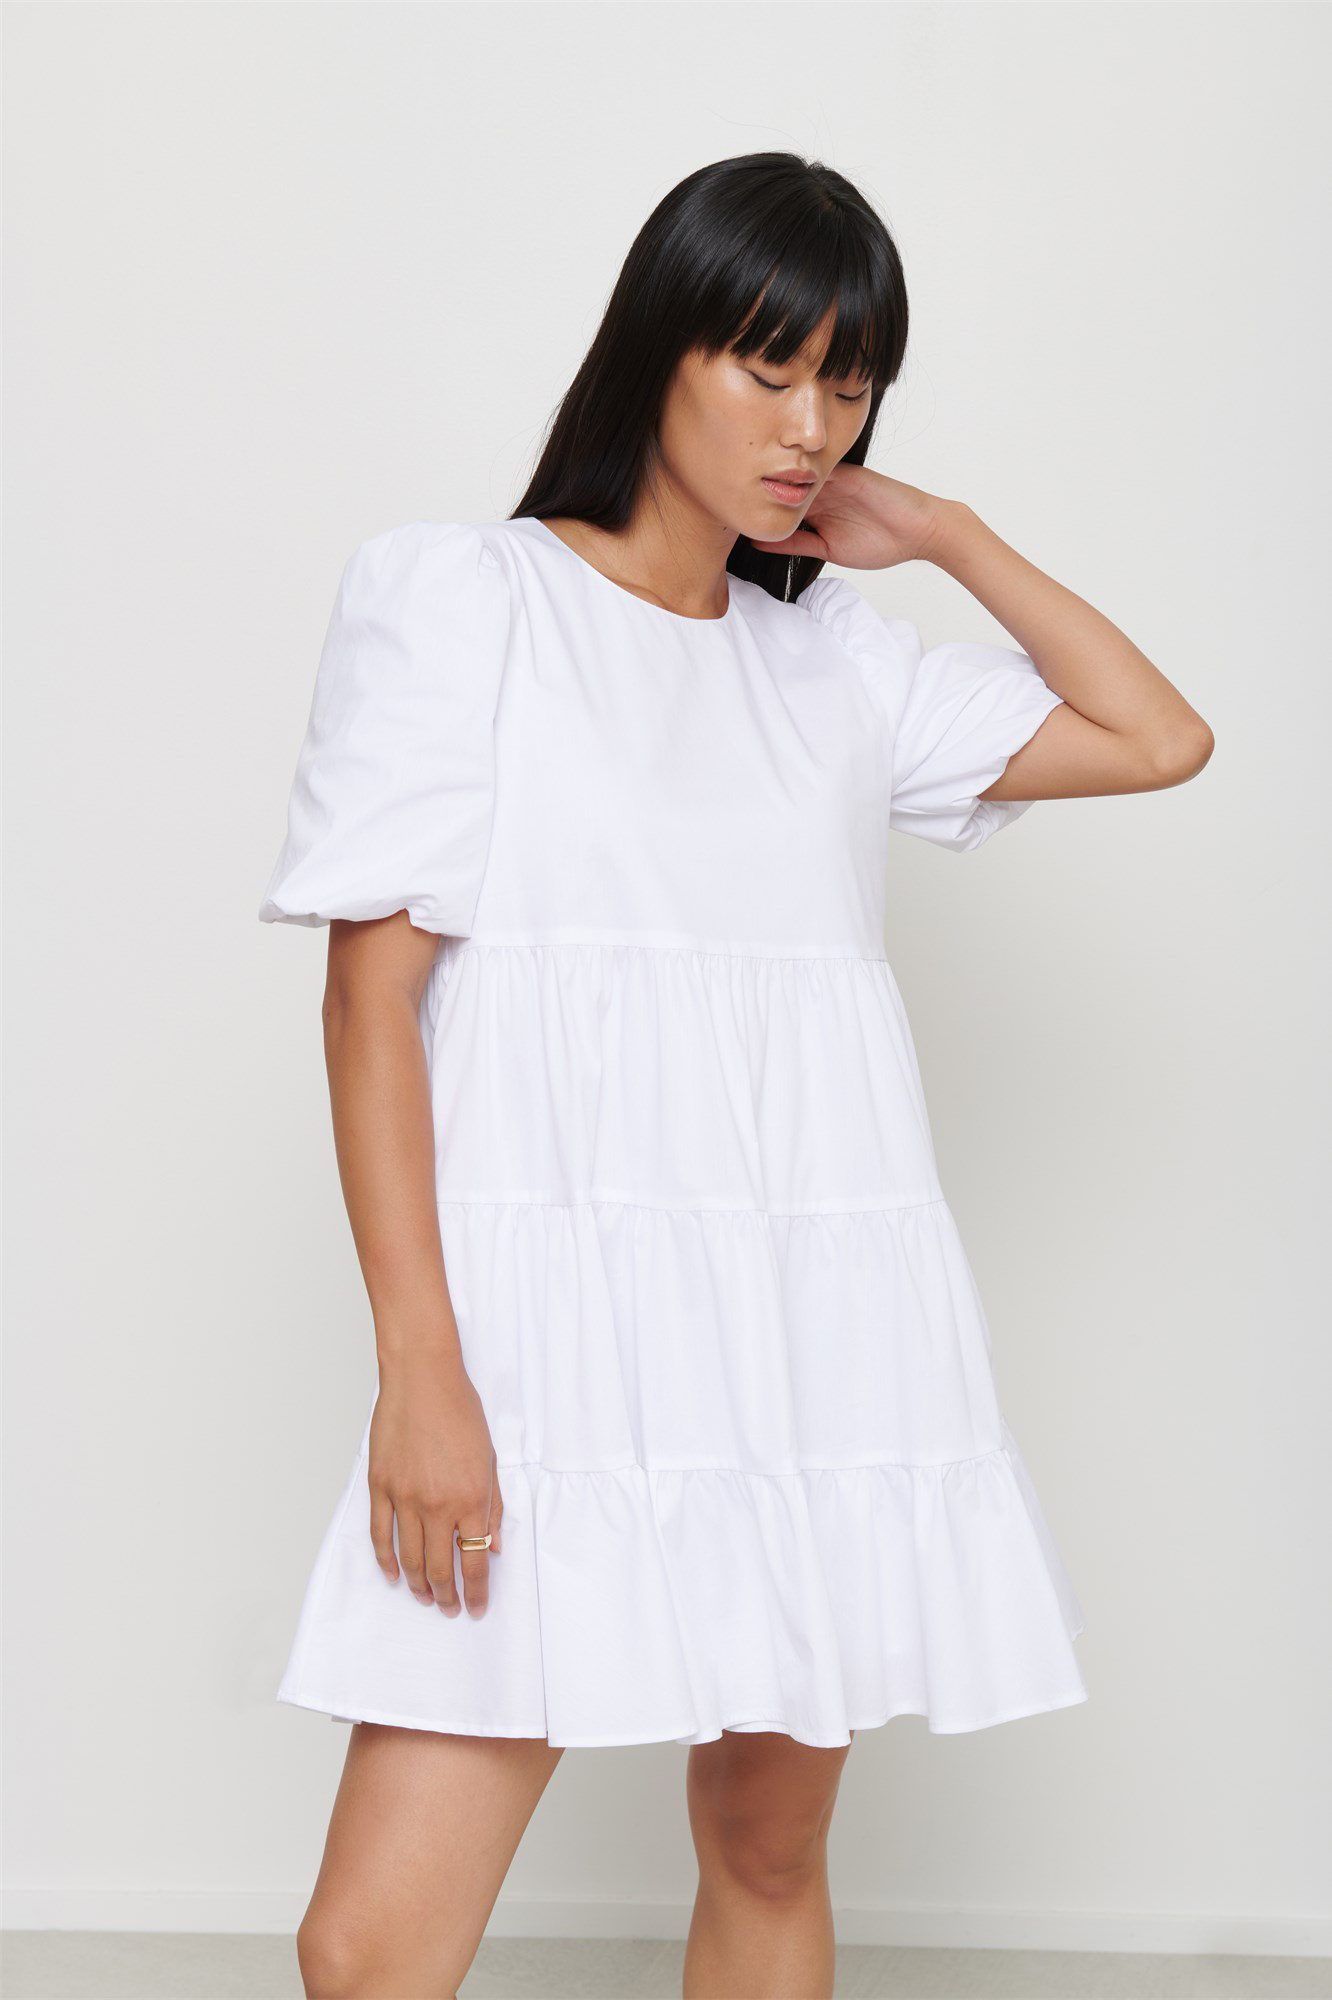 Francesca Poplin Trapeze Dress Trapeze Dress Dresses Dresses With Sleeves [ 2000 x 1332 Pixel ]